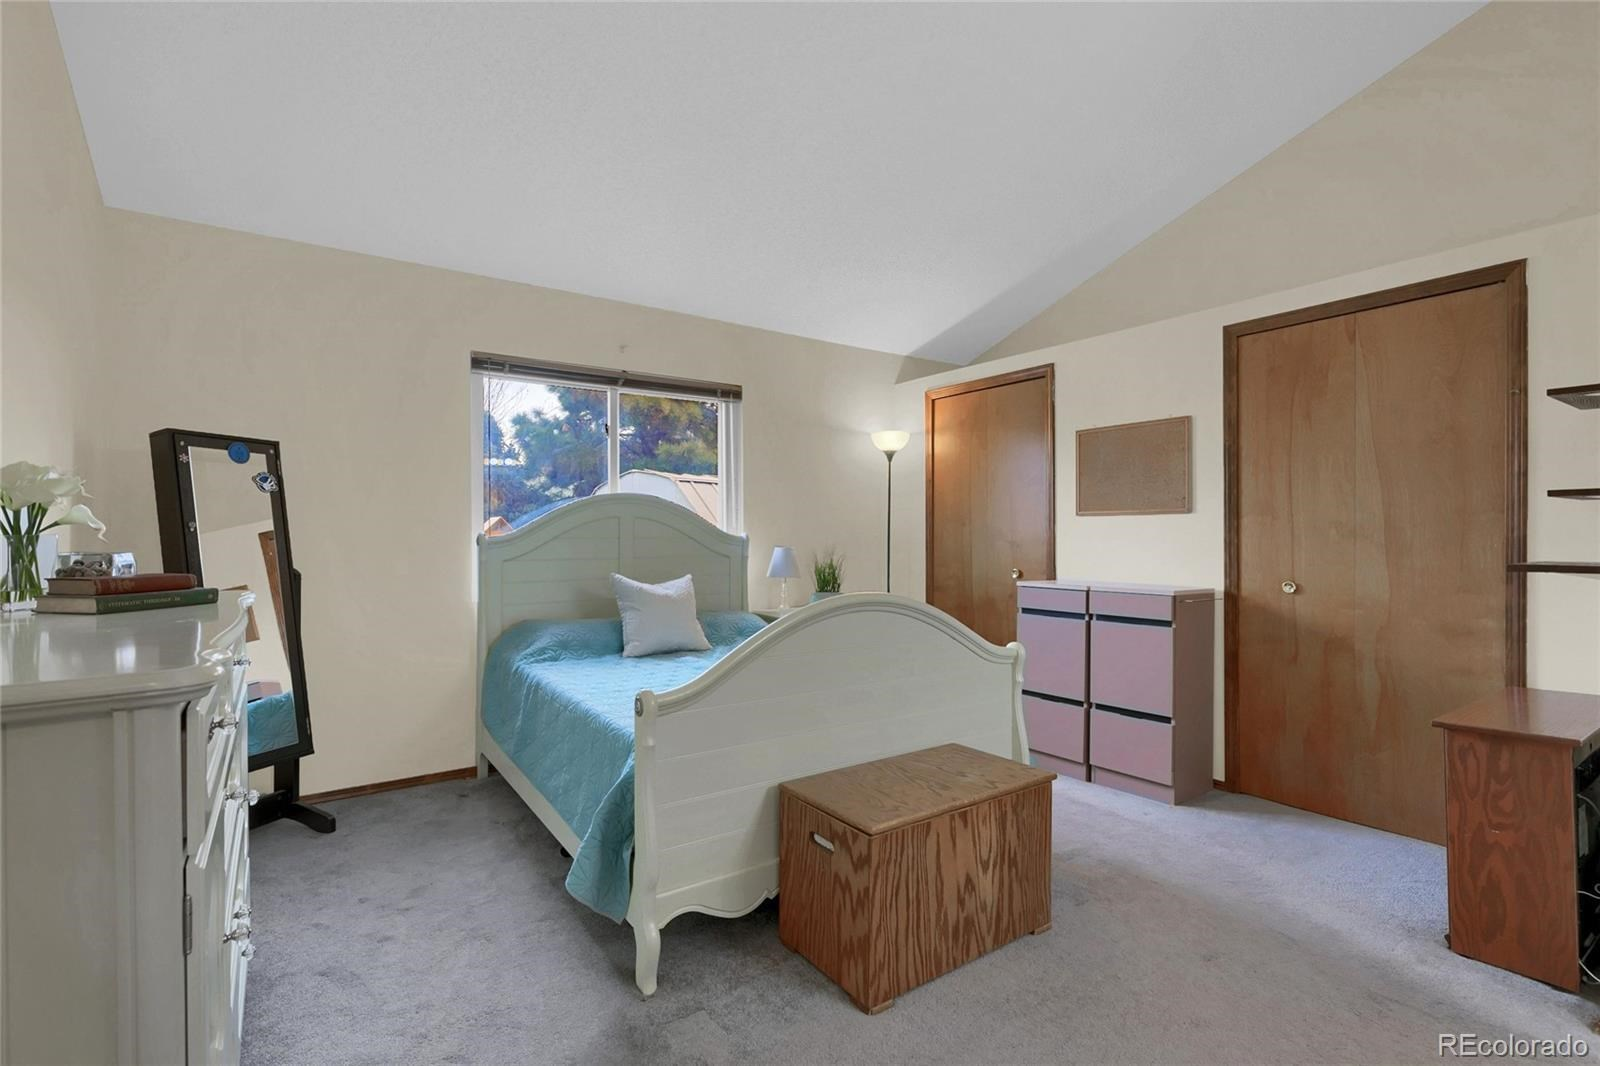 MLS# 7233537 - 12 - 8135 Camfield Circle, Colorado Springs, CO 80920